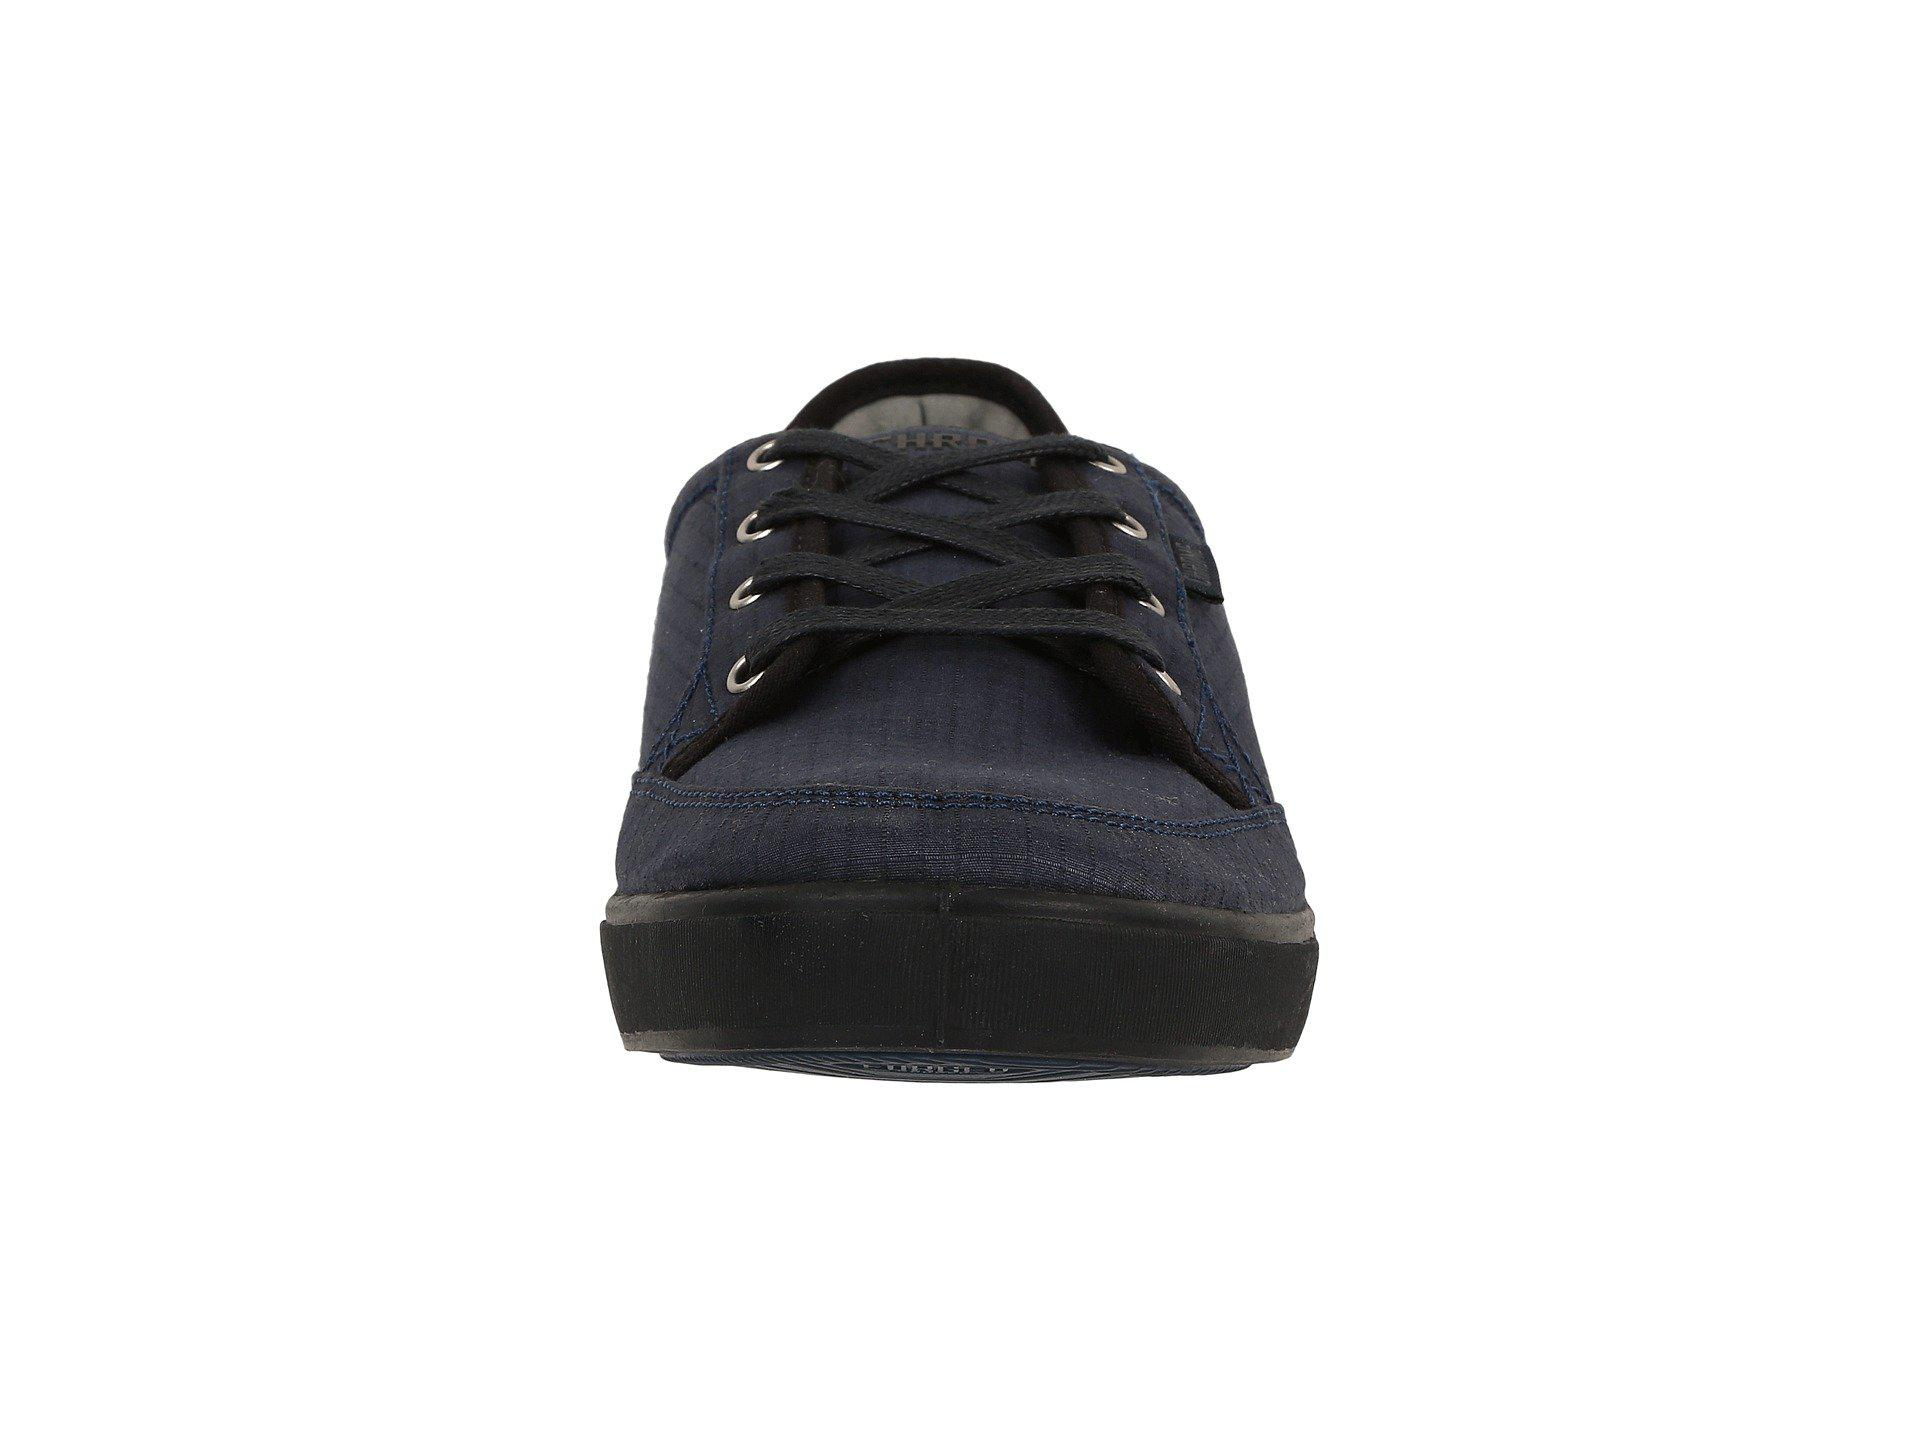 011398d97a Chrome Industries - Multicolor Mirko Box Canvas (indigo black) Men s Shoes  for Men. View fullscreen